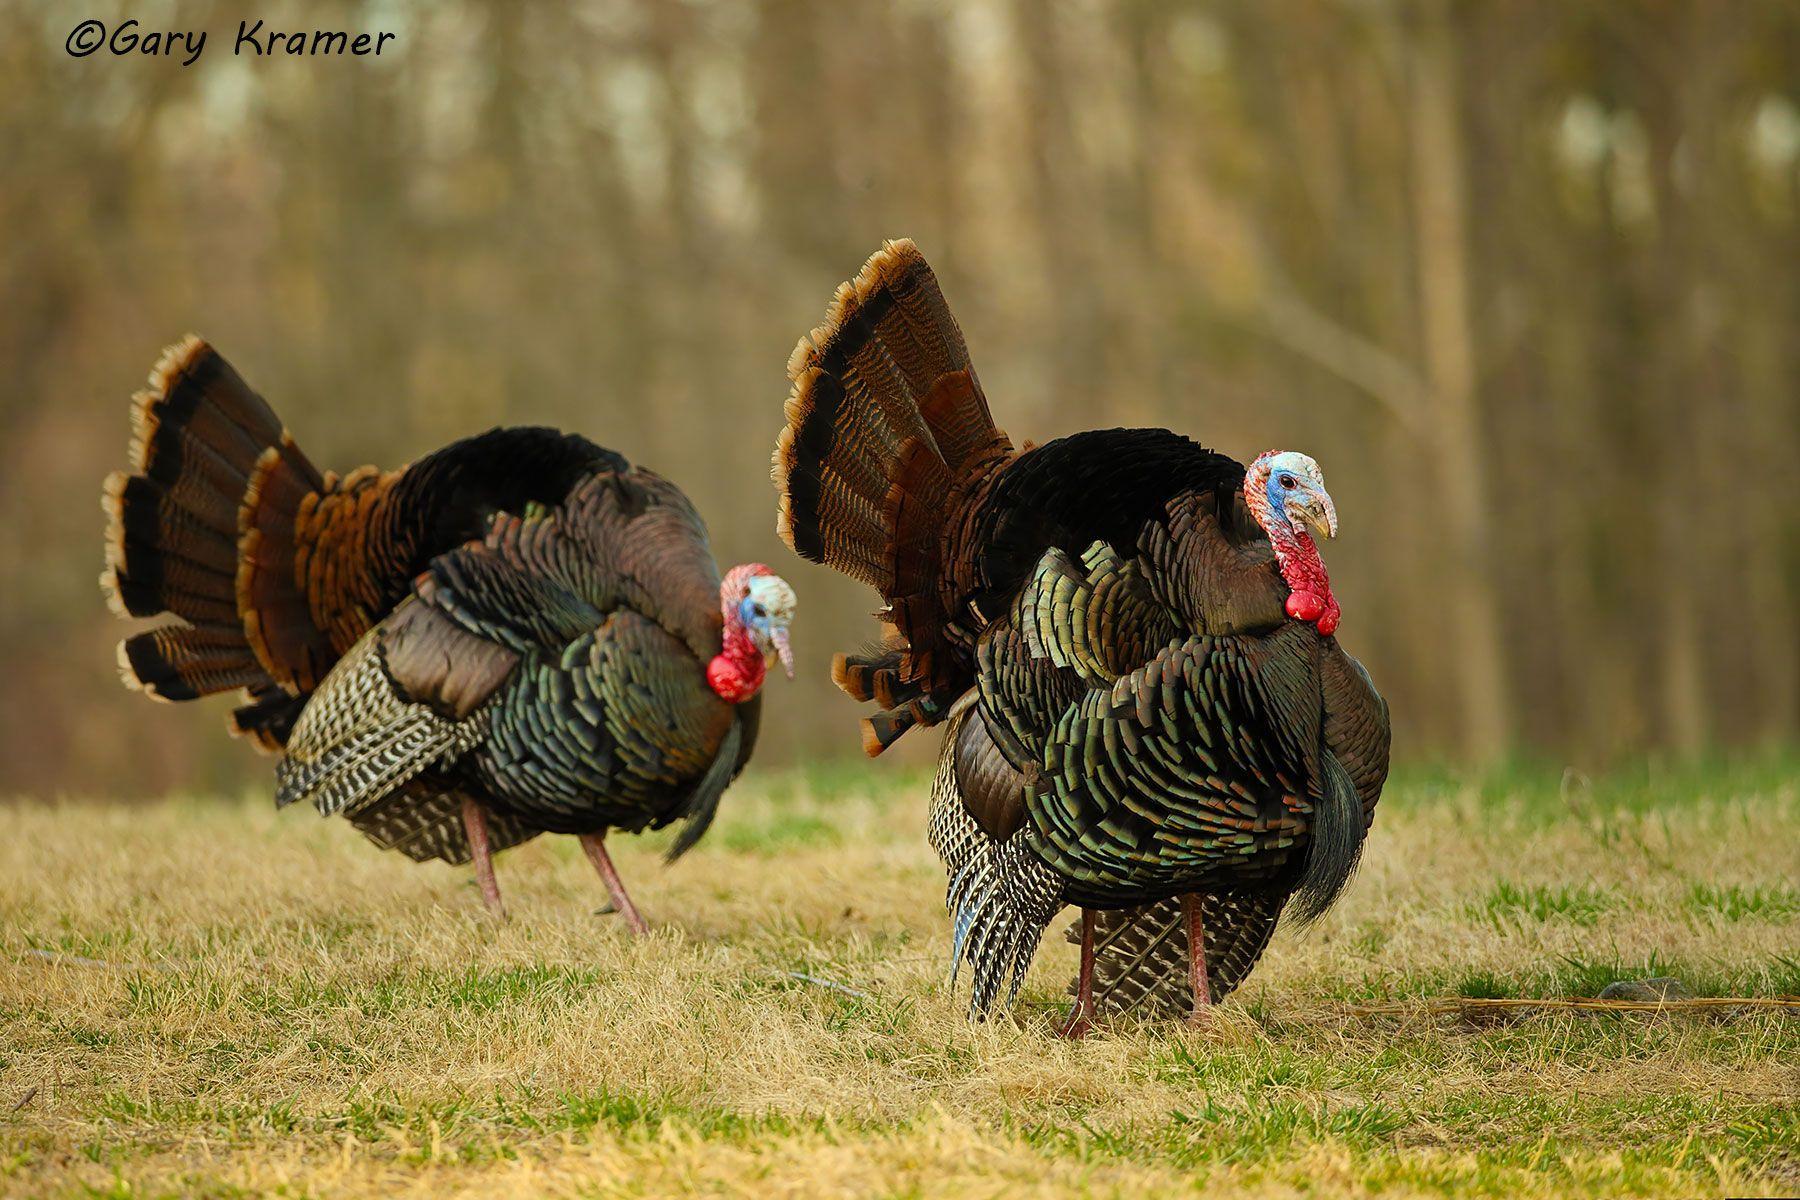 Wild Turkey (Eastern) (Meleagris gallopavo silvestris) - NBGTe#1103d